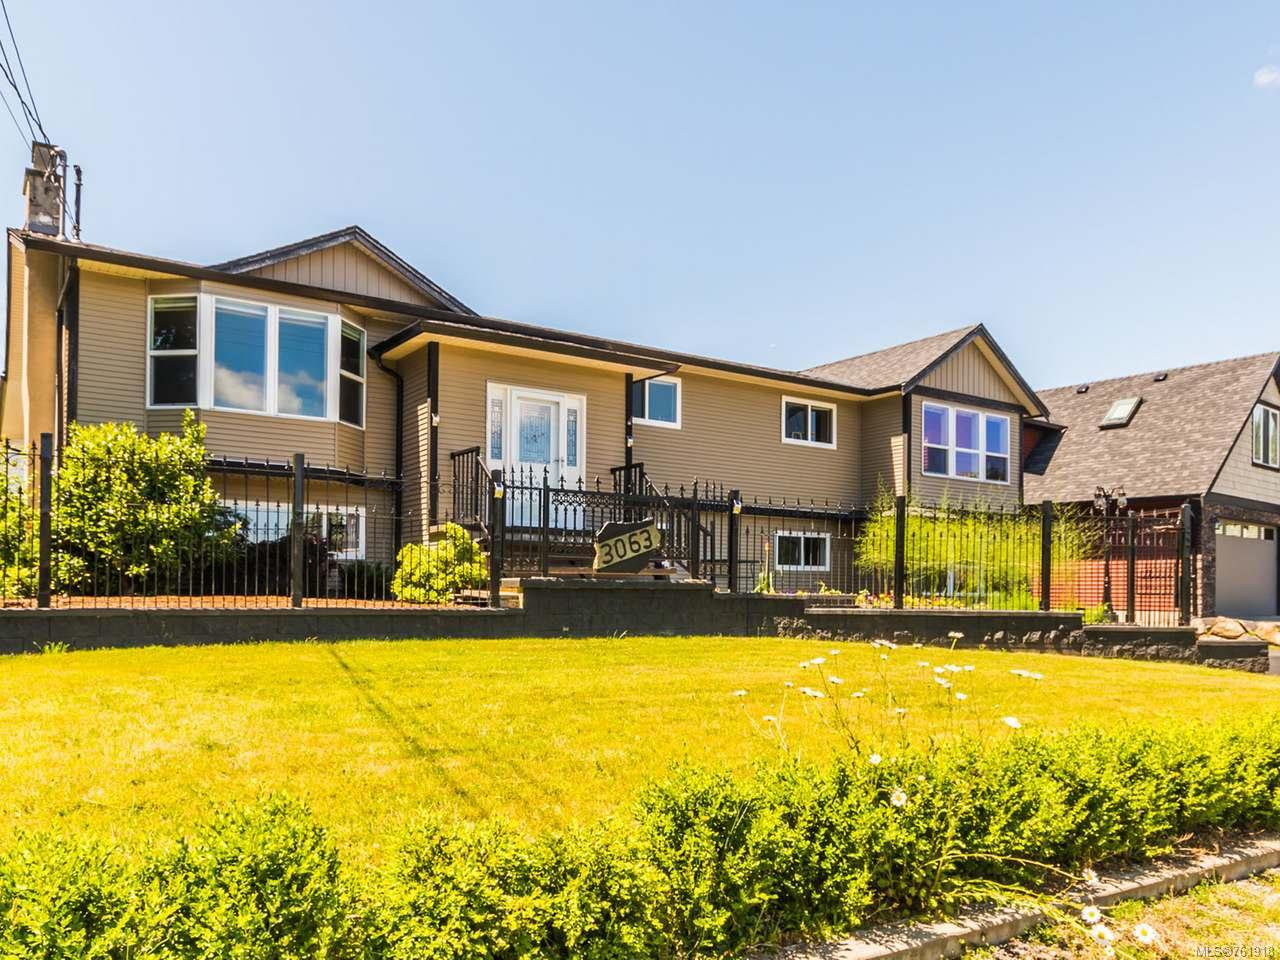 Main Photo: 3063 NEYLAND ROAD in NANAIMO: Na Departure Bay House for sale (Nanaimo)  : MLS®# 761918